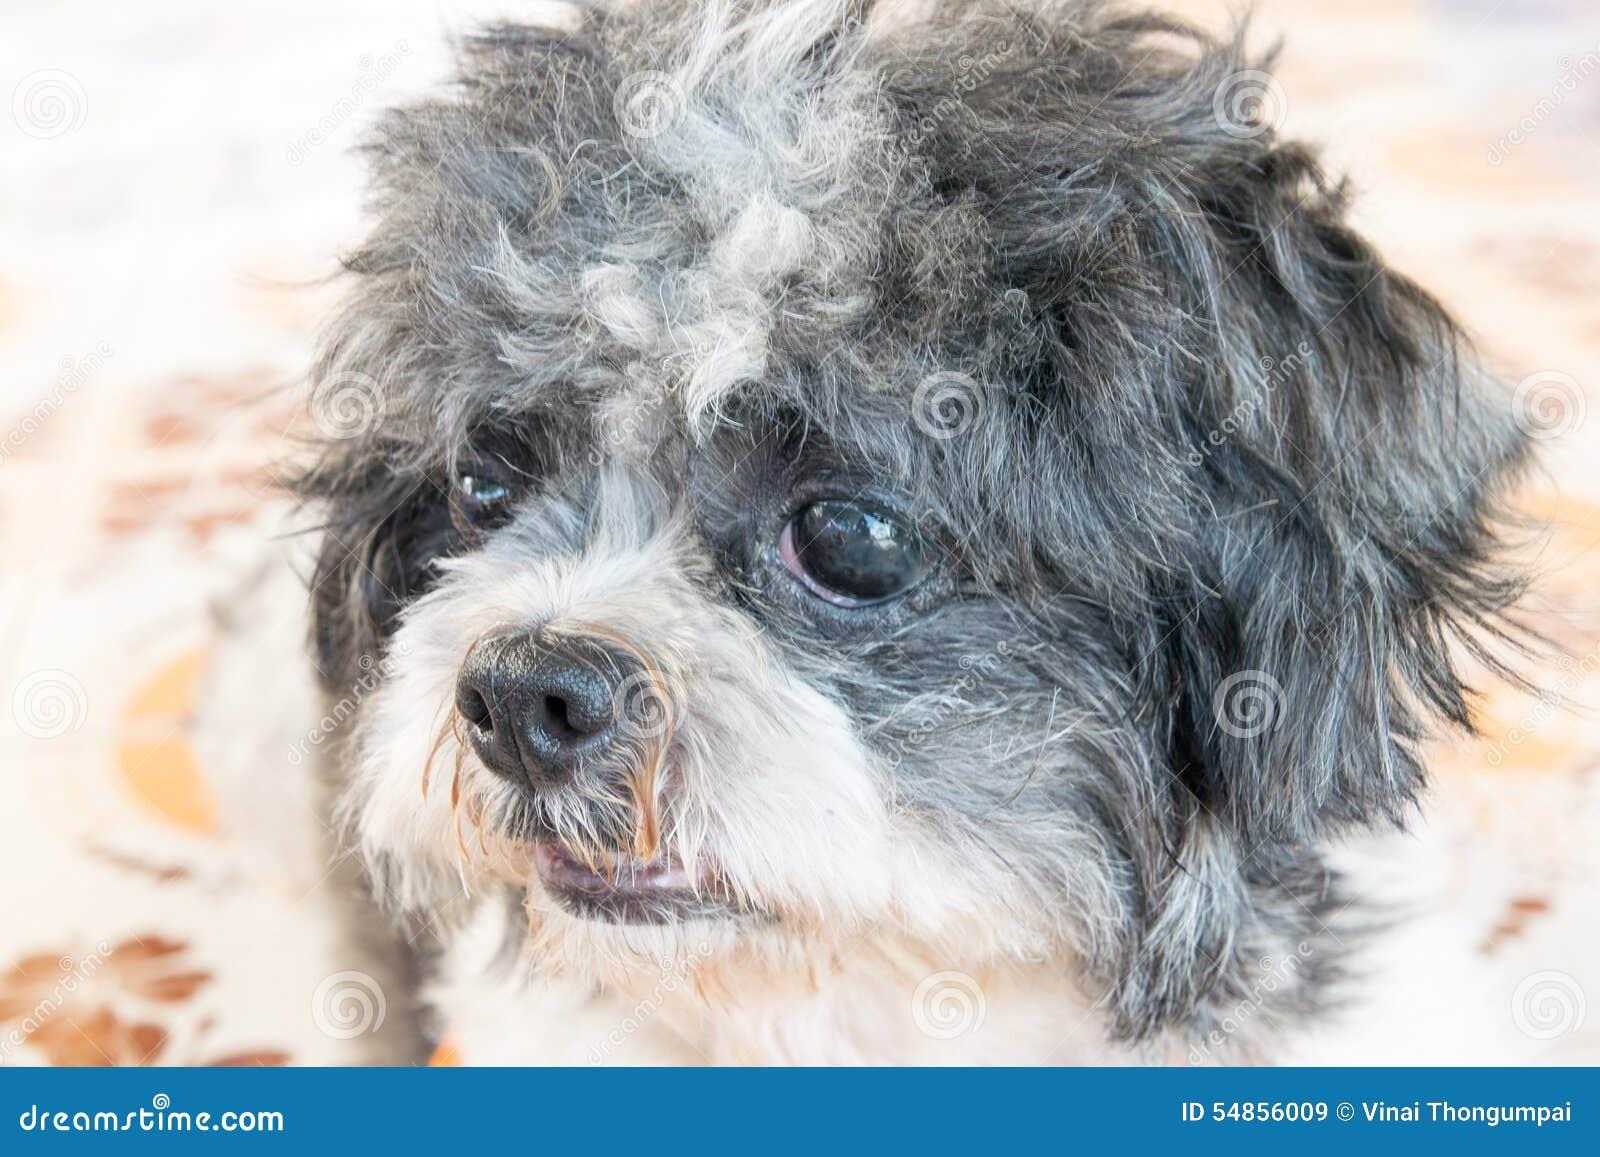 Close up old shih tzu dog face